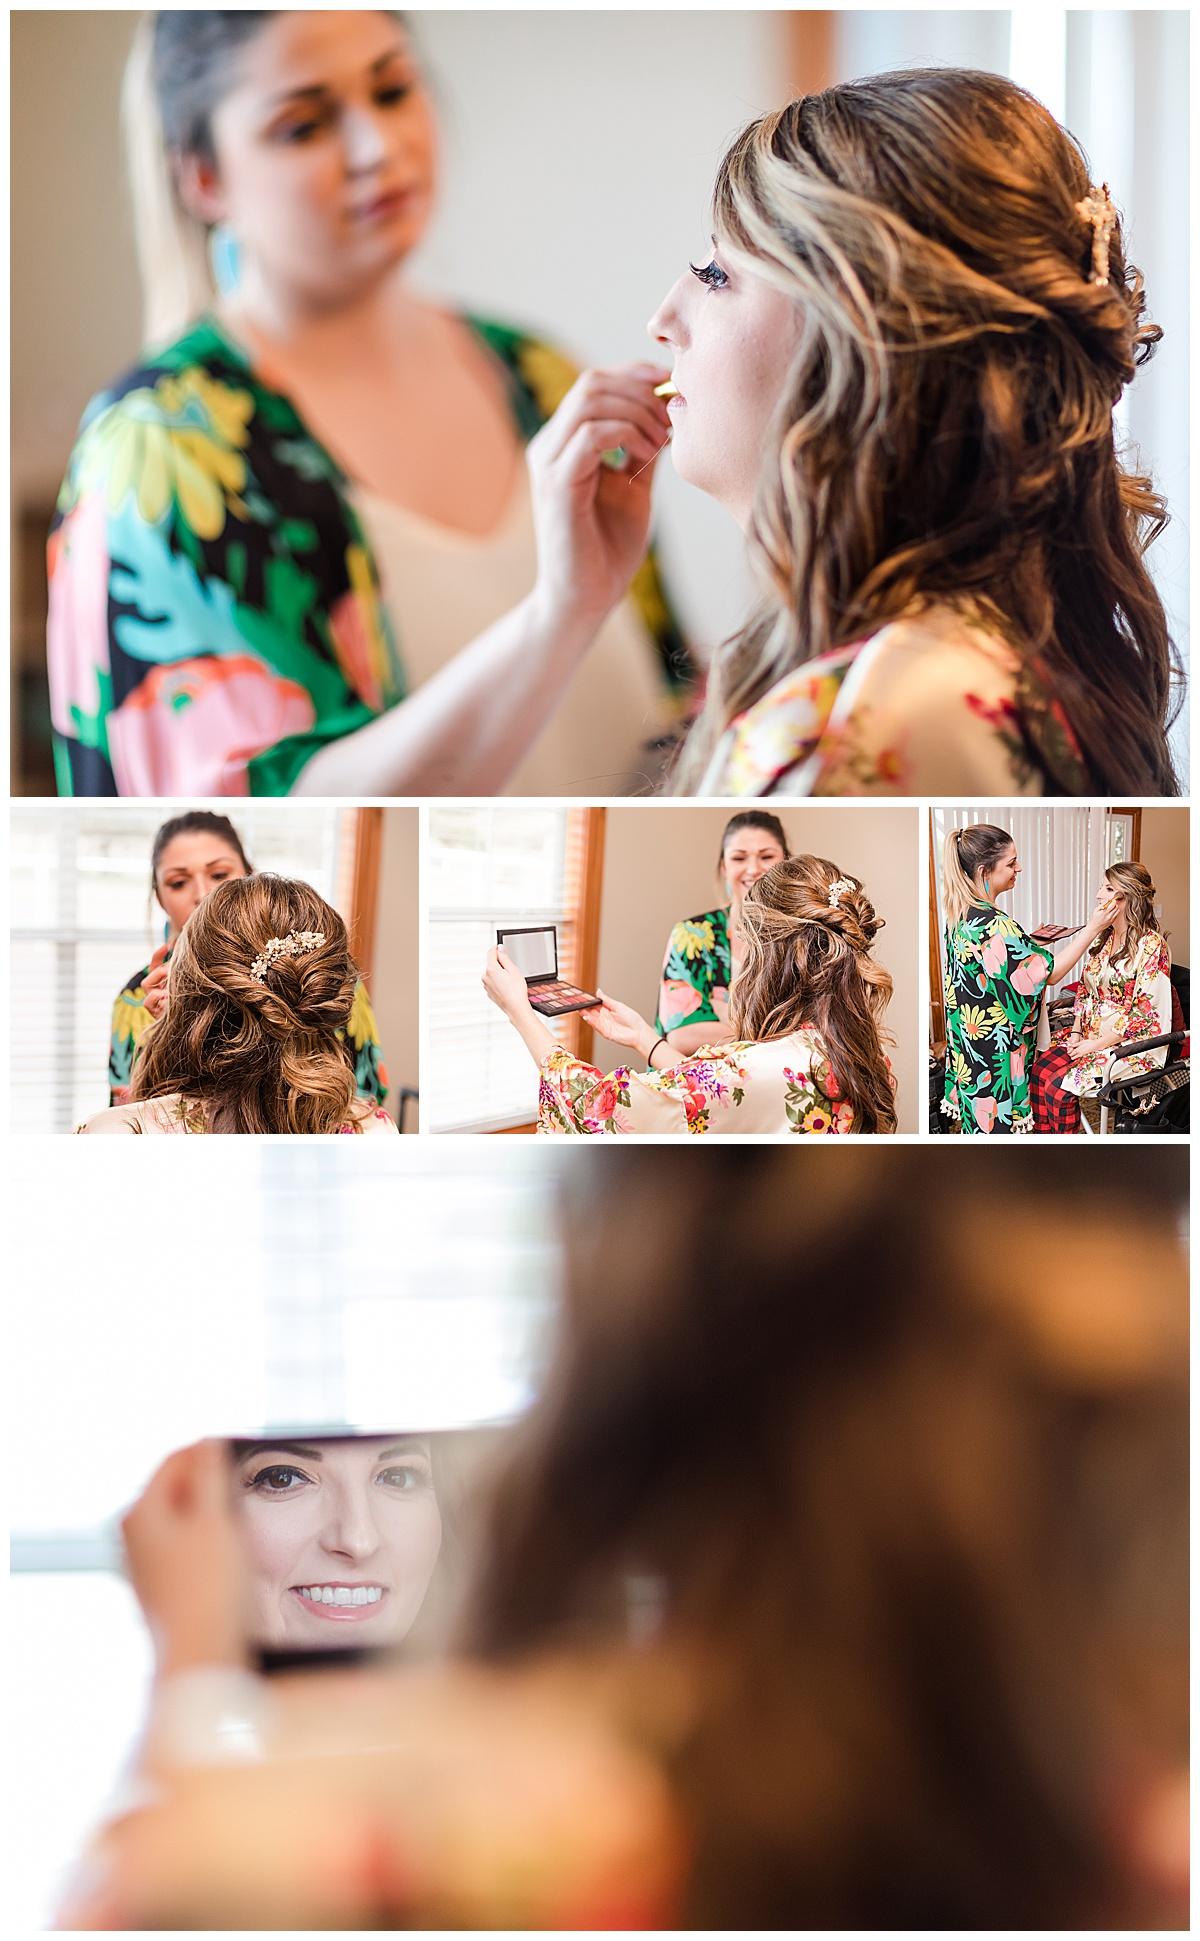 Wedding-Photographer-Texas-Hill-Country-Happy-H-Ranch-Comfor-Texas-Carly-Barton-Photography_0008.jpg